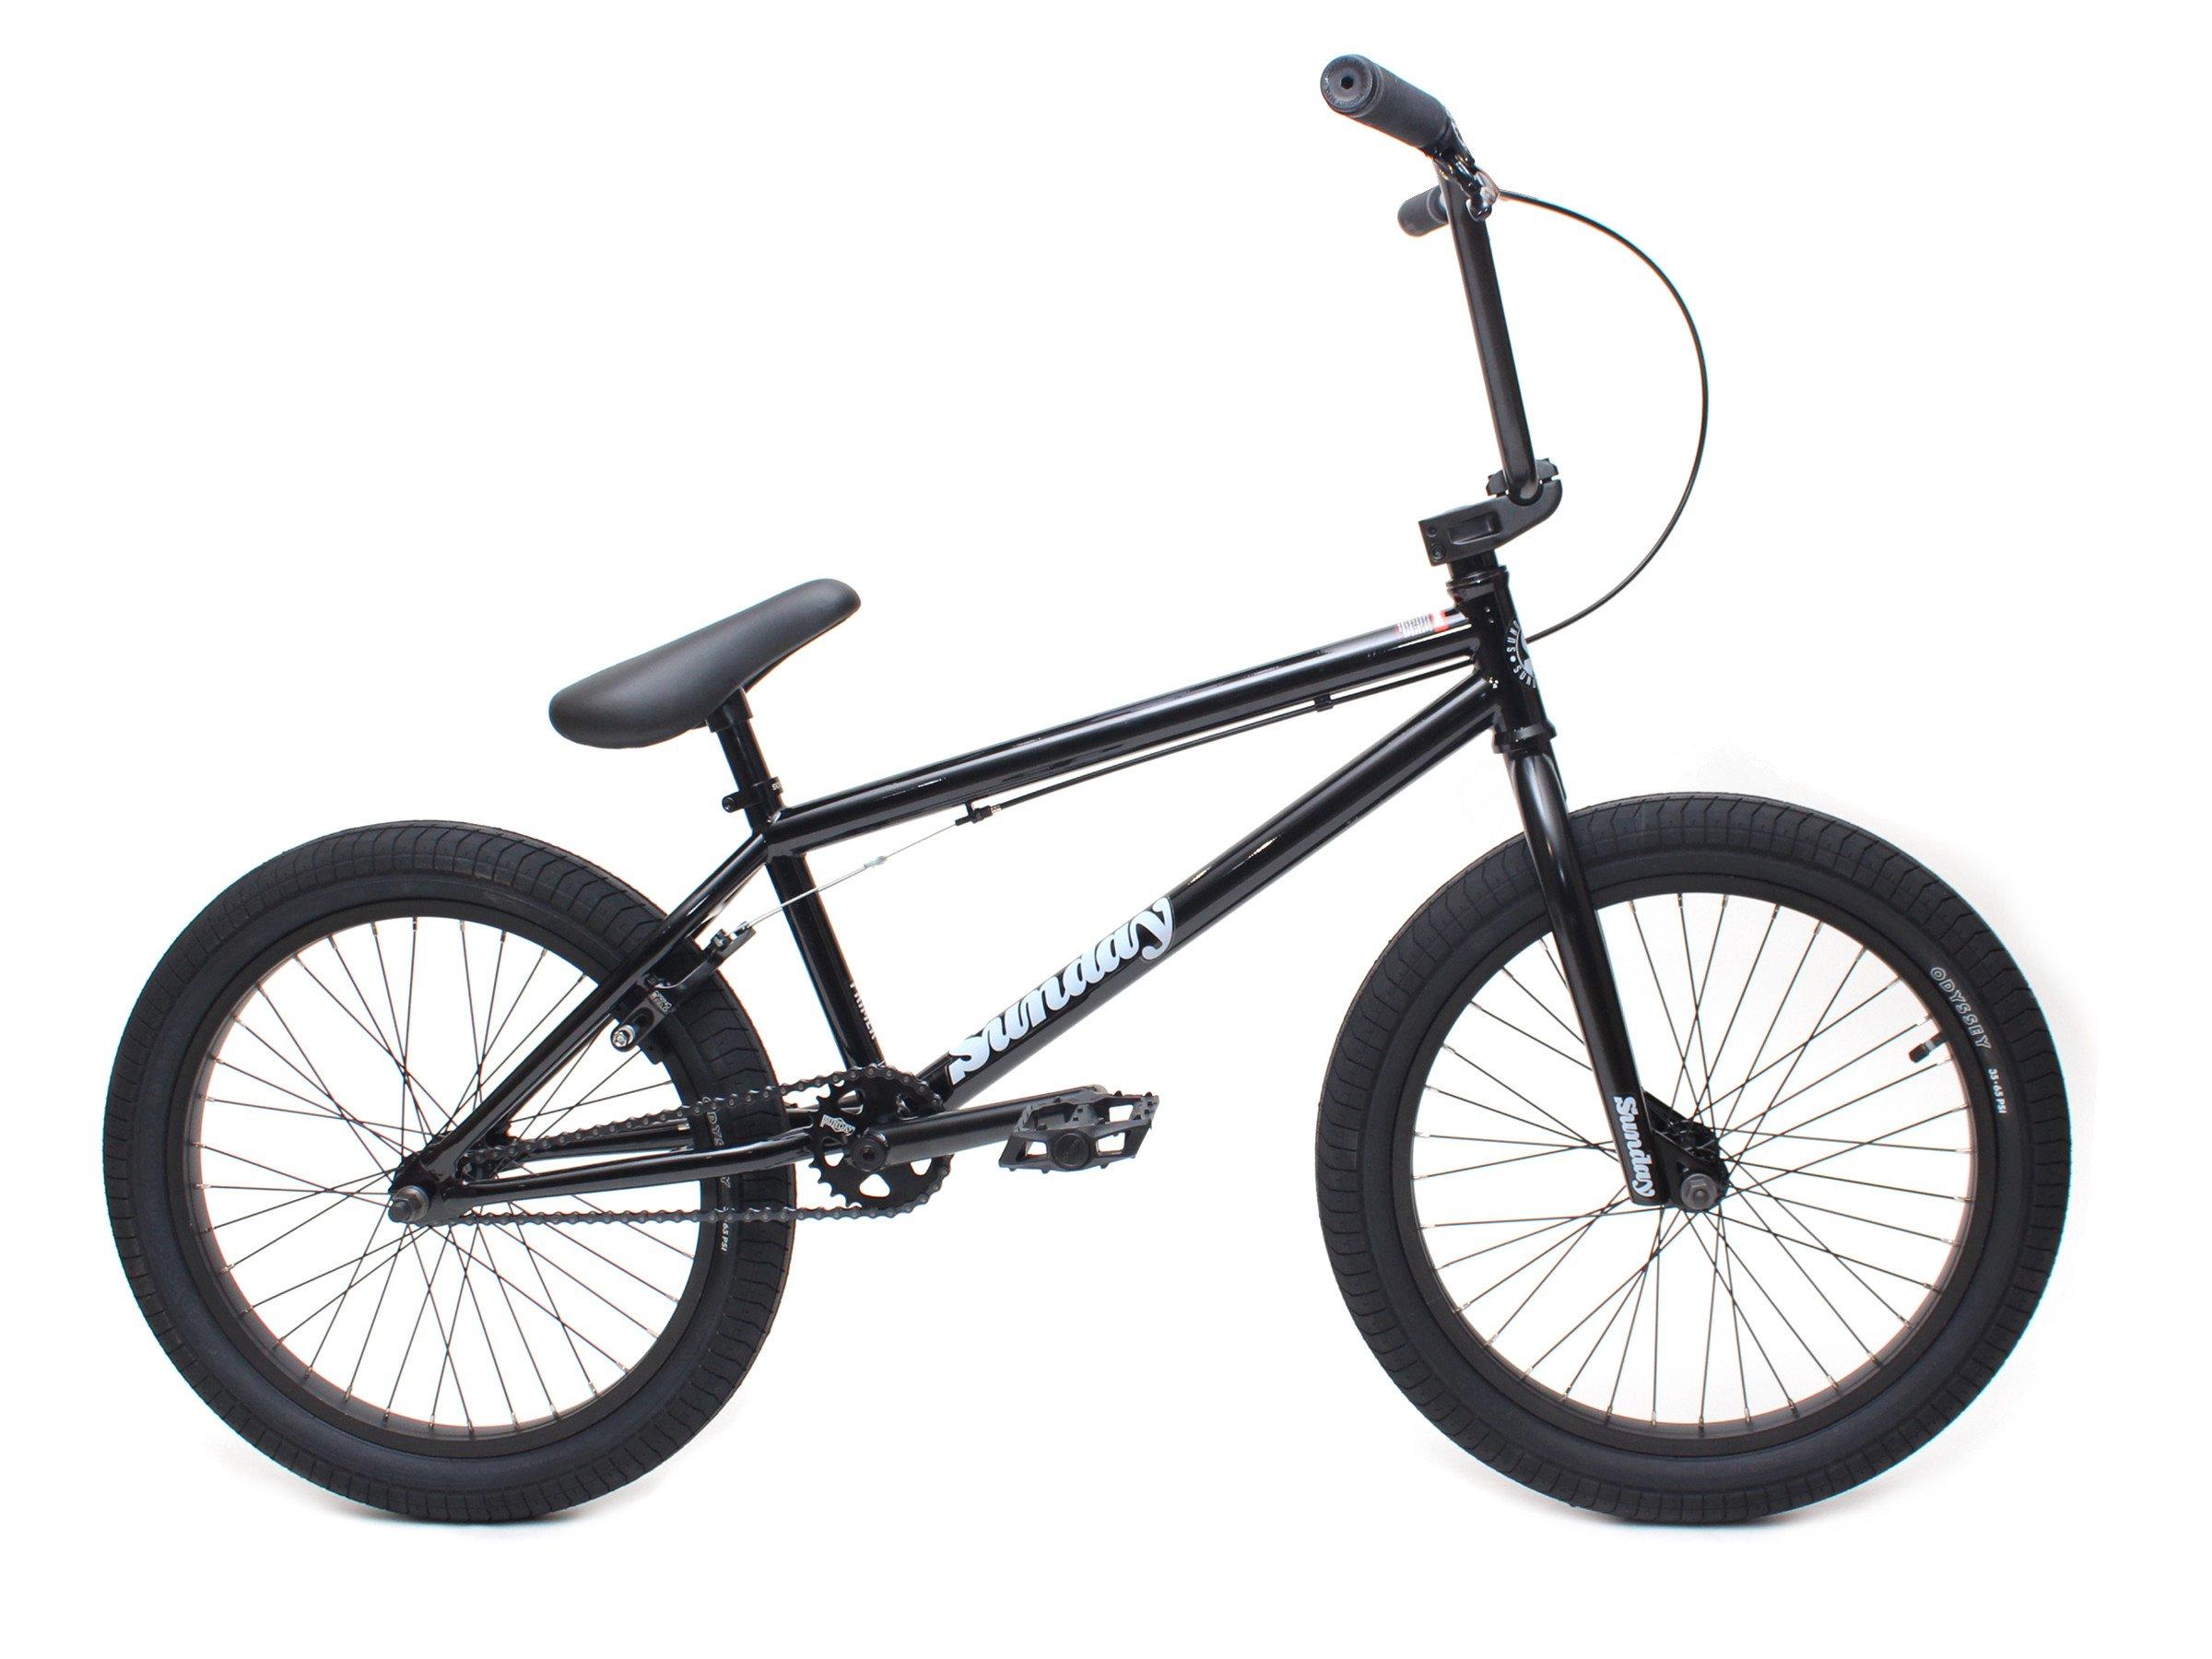 "SUBROSA RAY BARS BMX BIKE BICYCLE 8.75/"" FIT CULT HARO SE SHADOW KINK CHROME NEW"